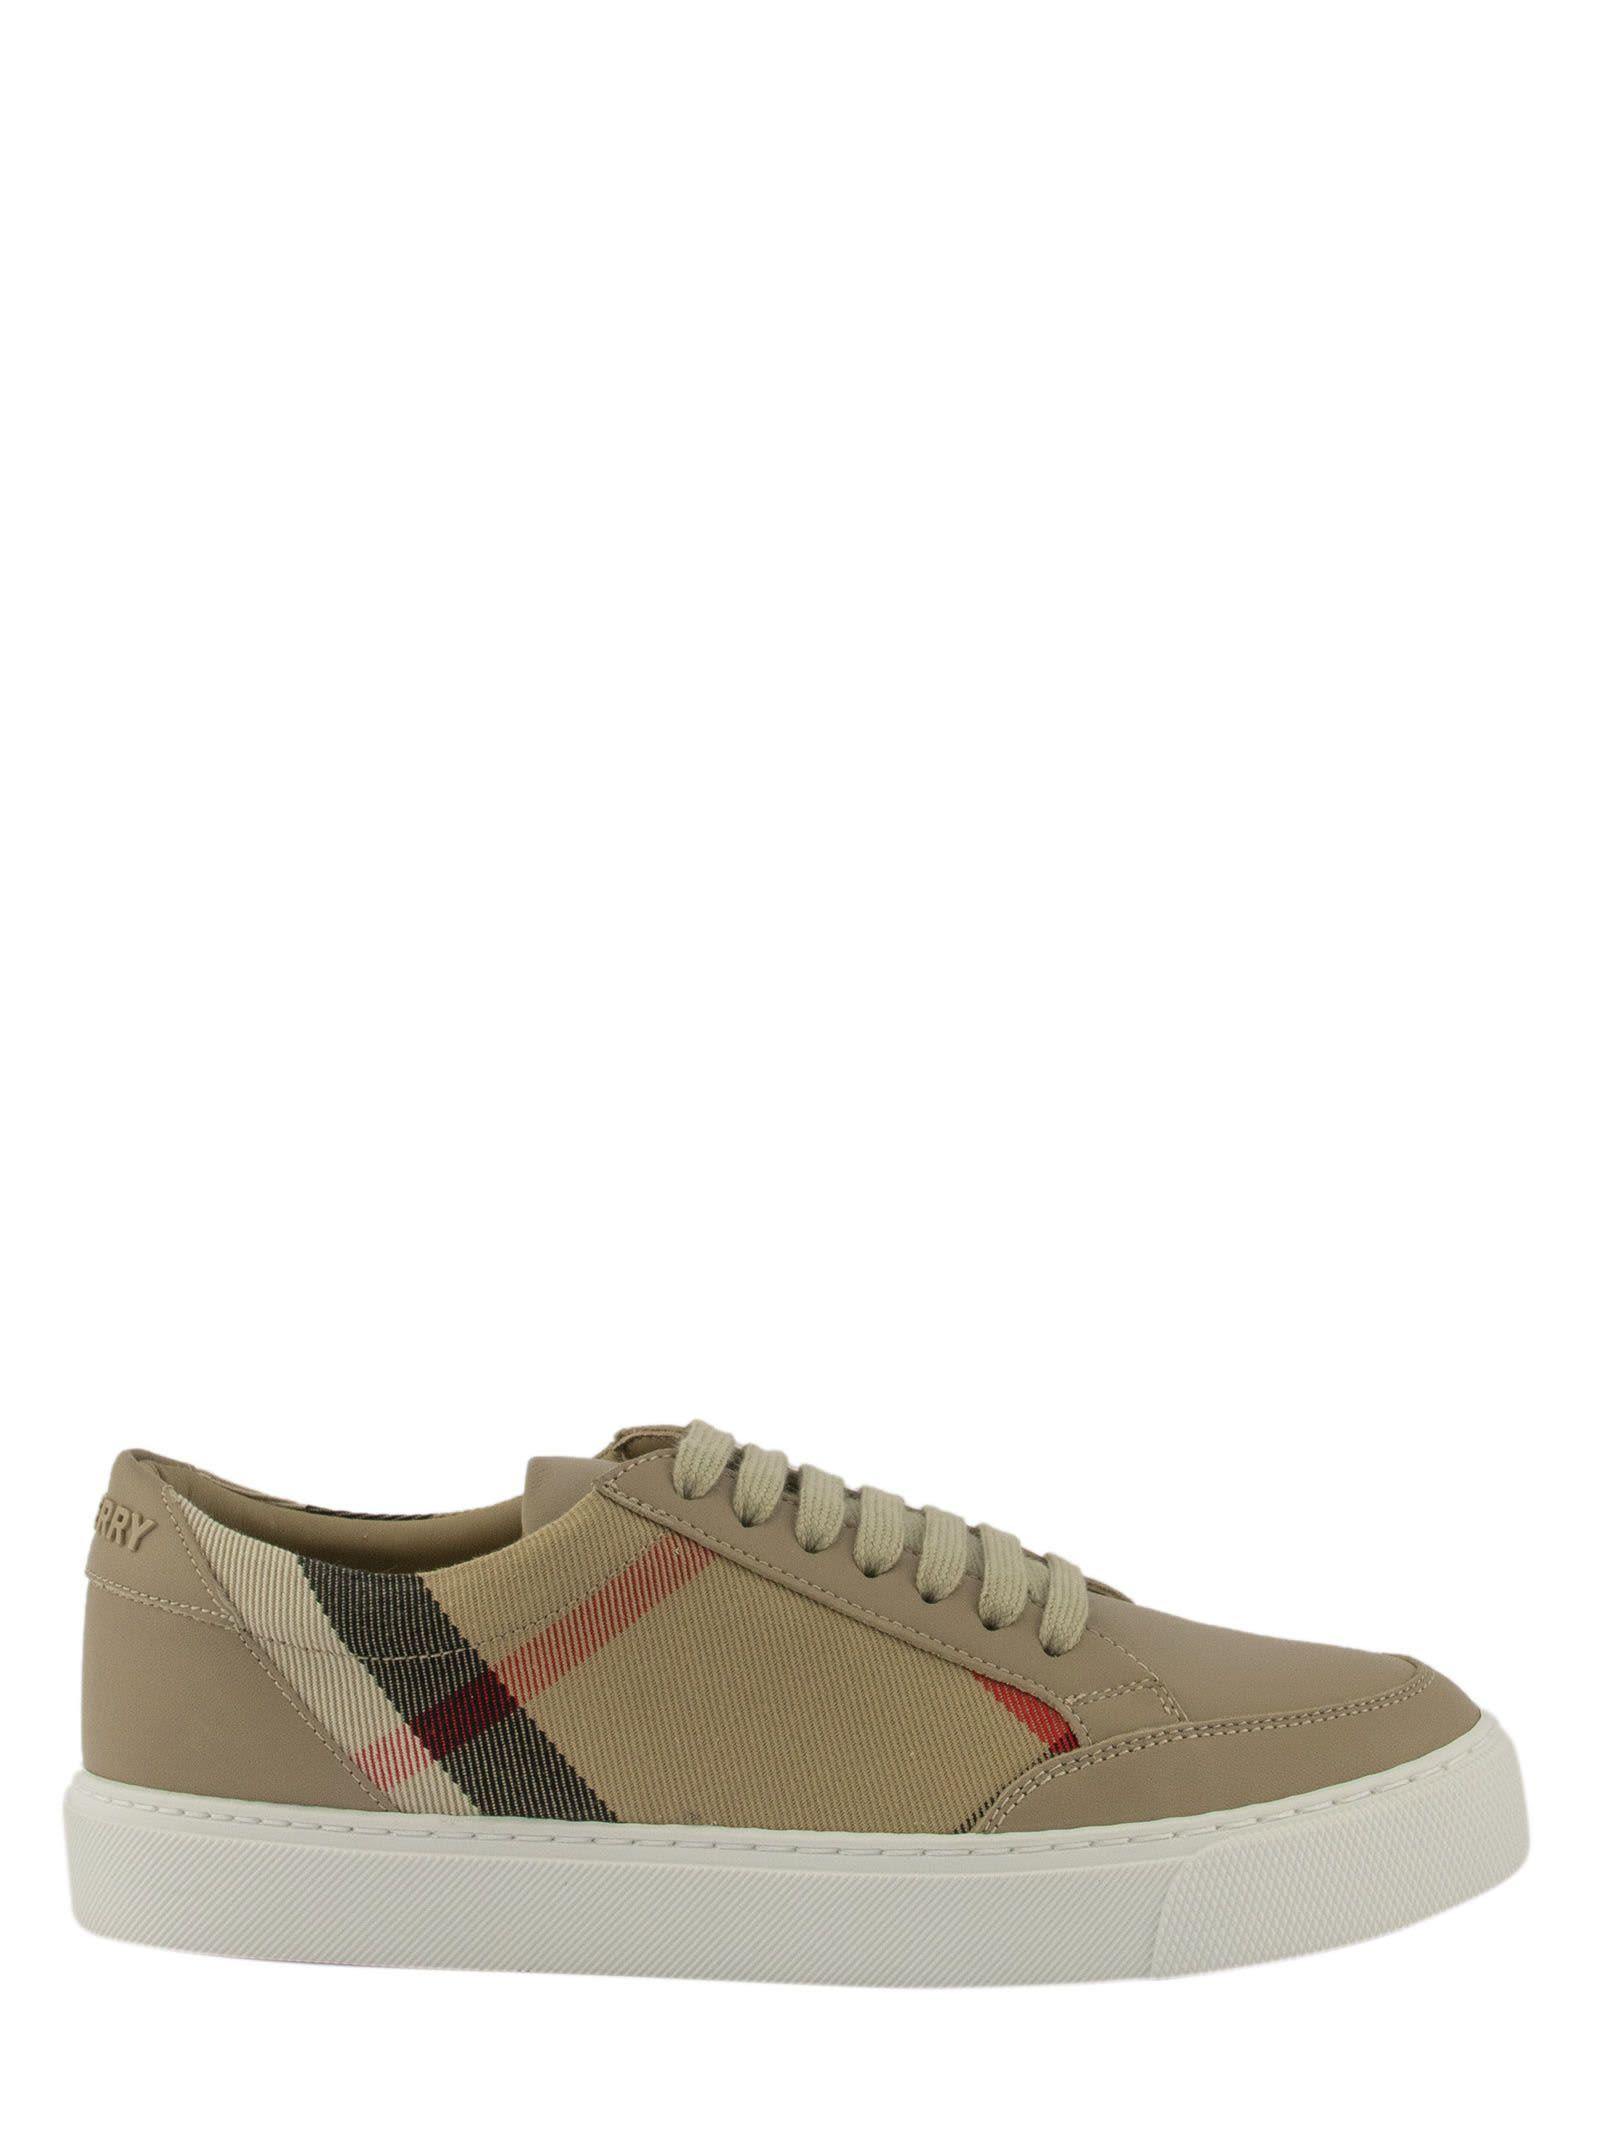 Burberry Sneakers | italist, ALWAYS